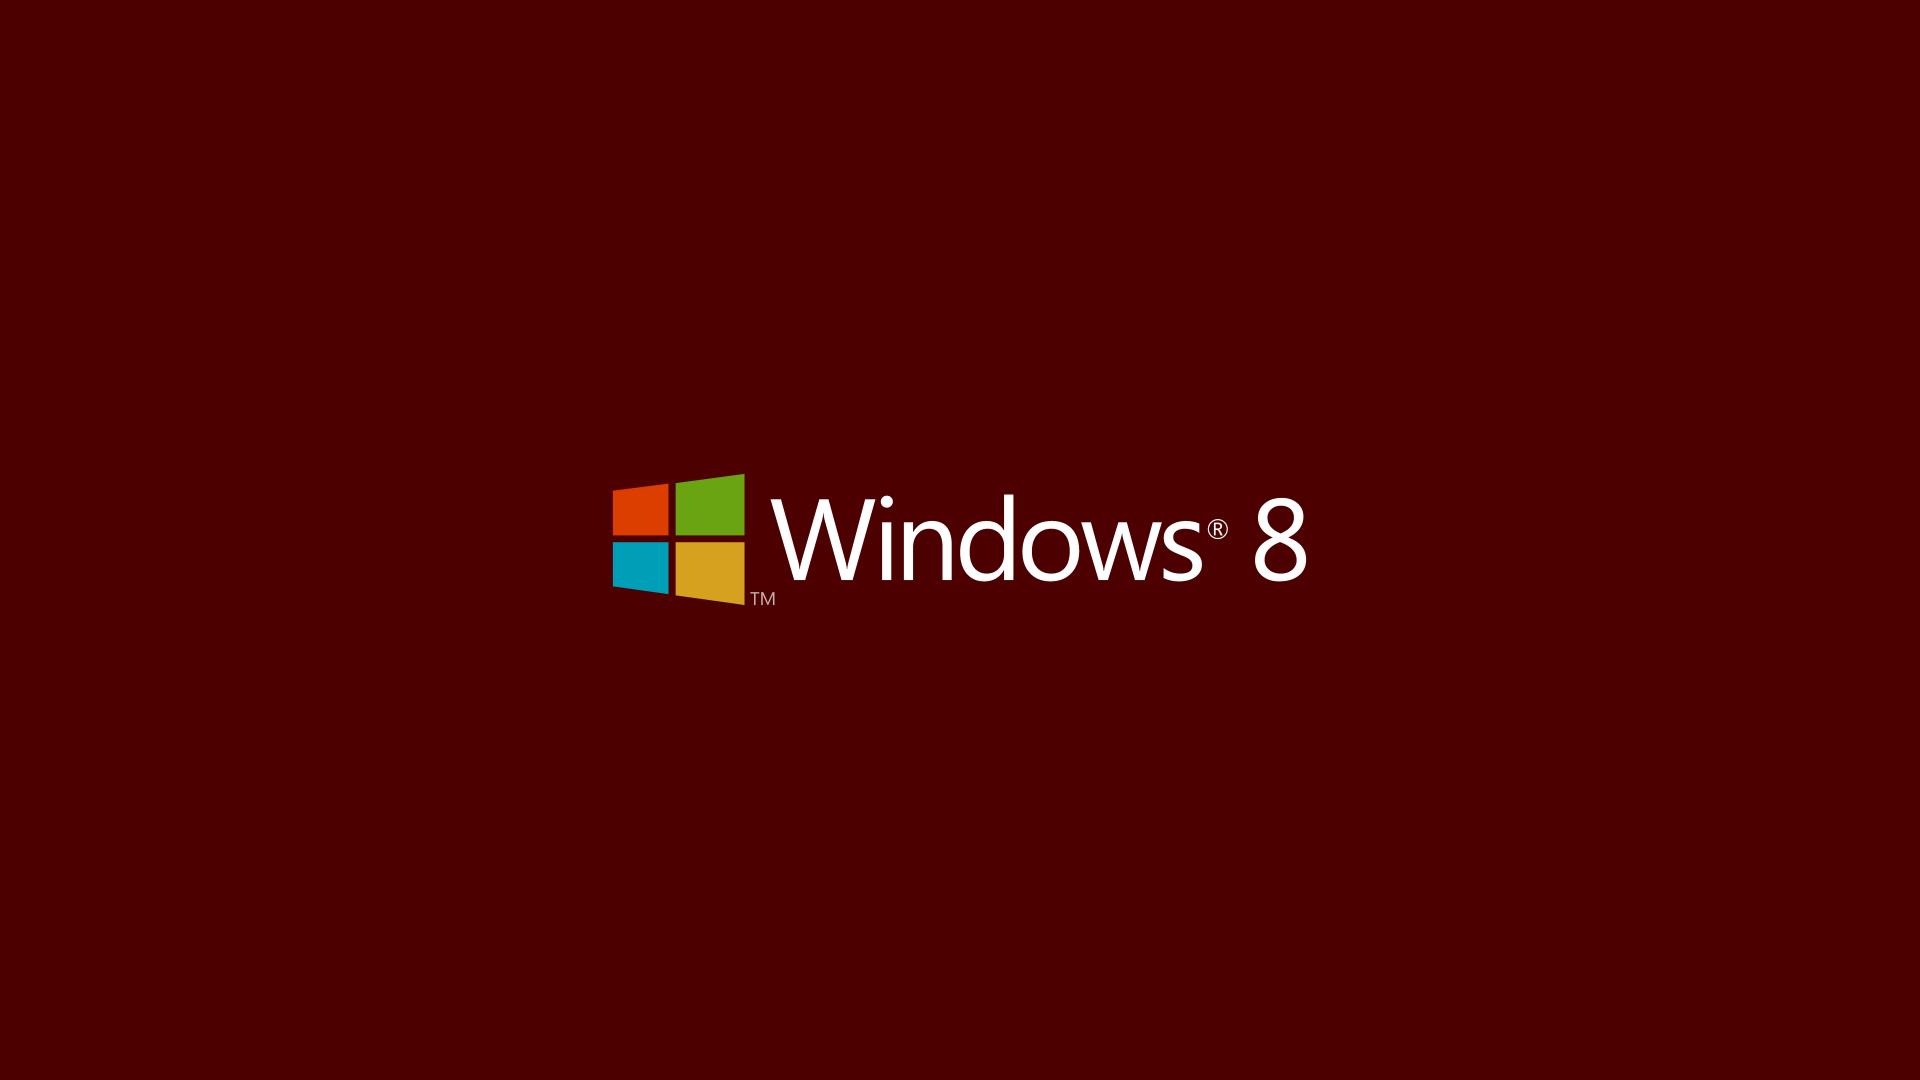 Microsoft wallpapers hd desktop backgrounds images and pictures microsoft wallpapers hd desktop backgrounds images and pictures voltagebd Choice Image